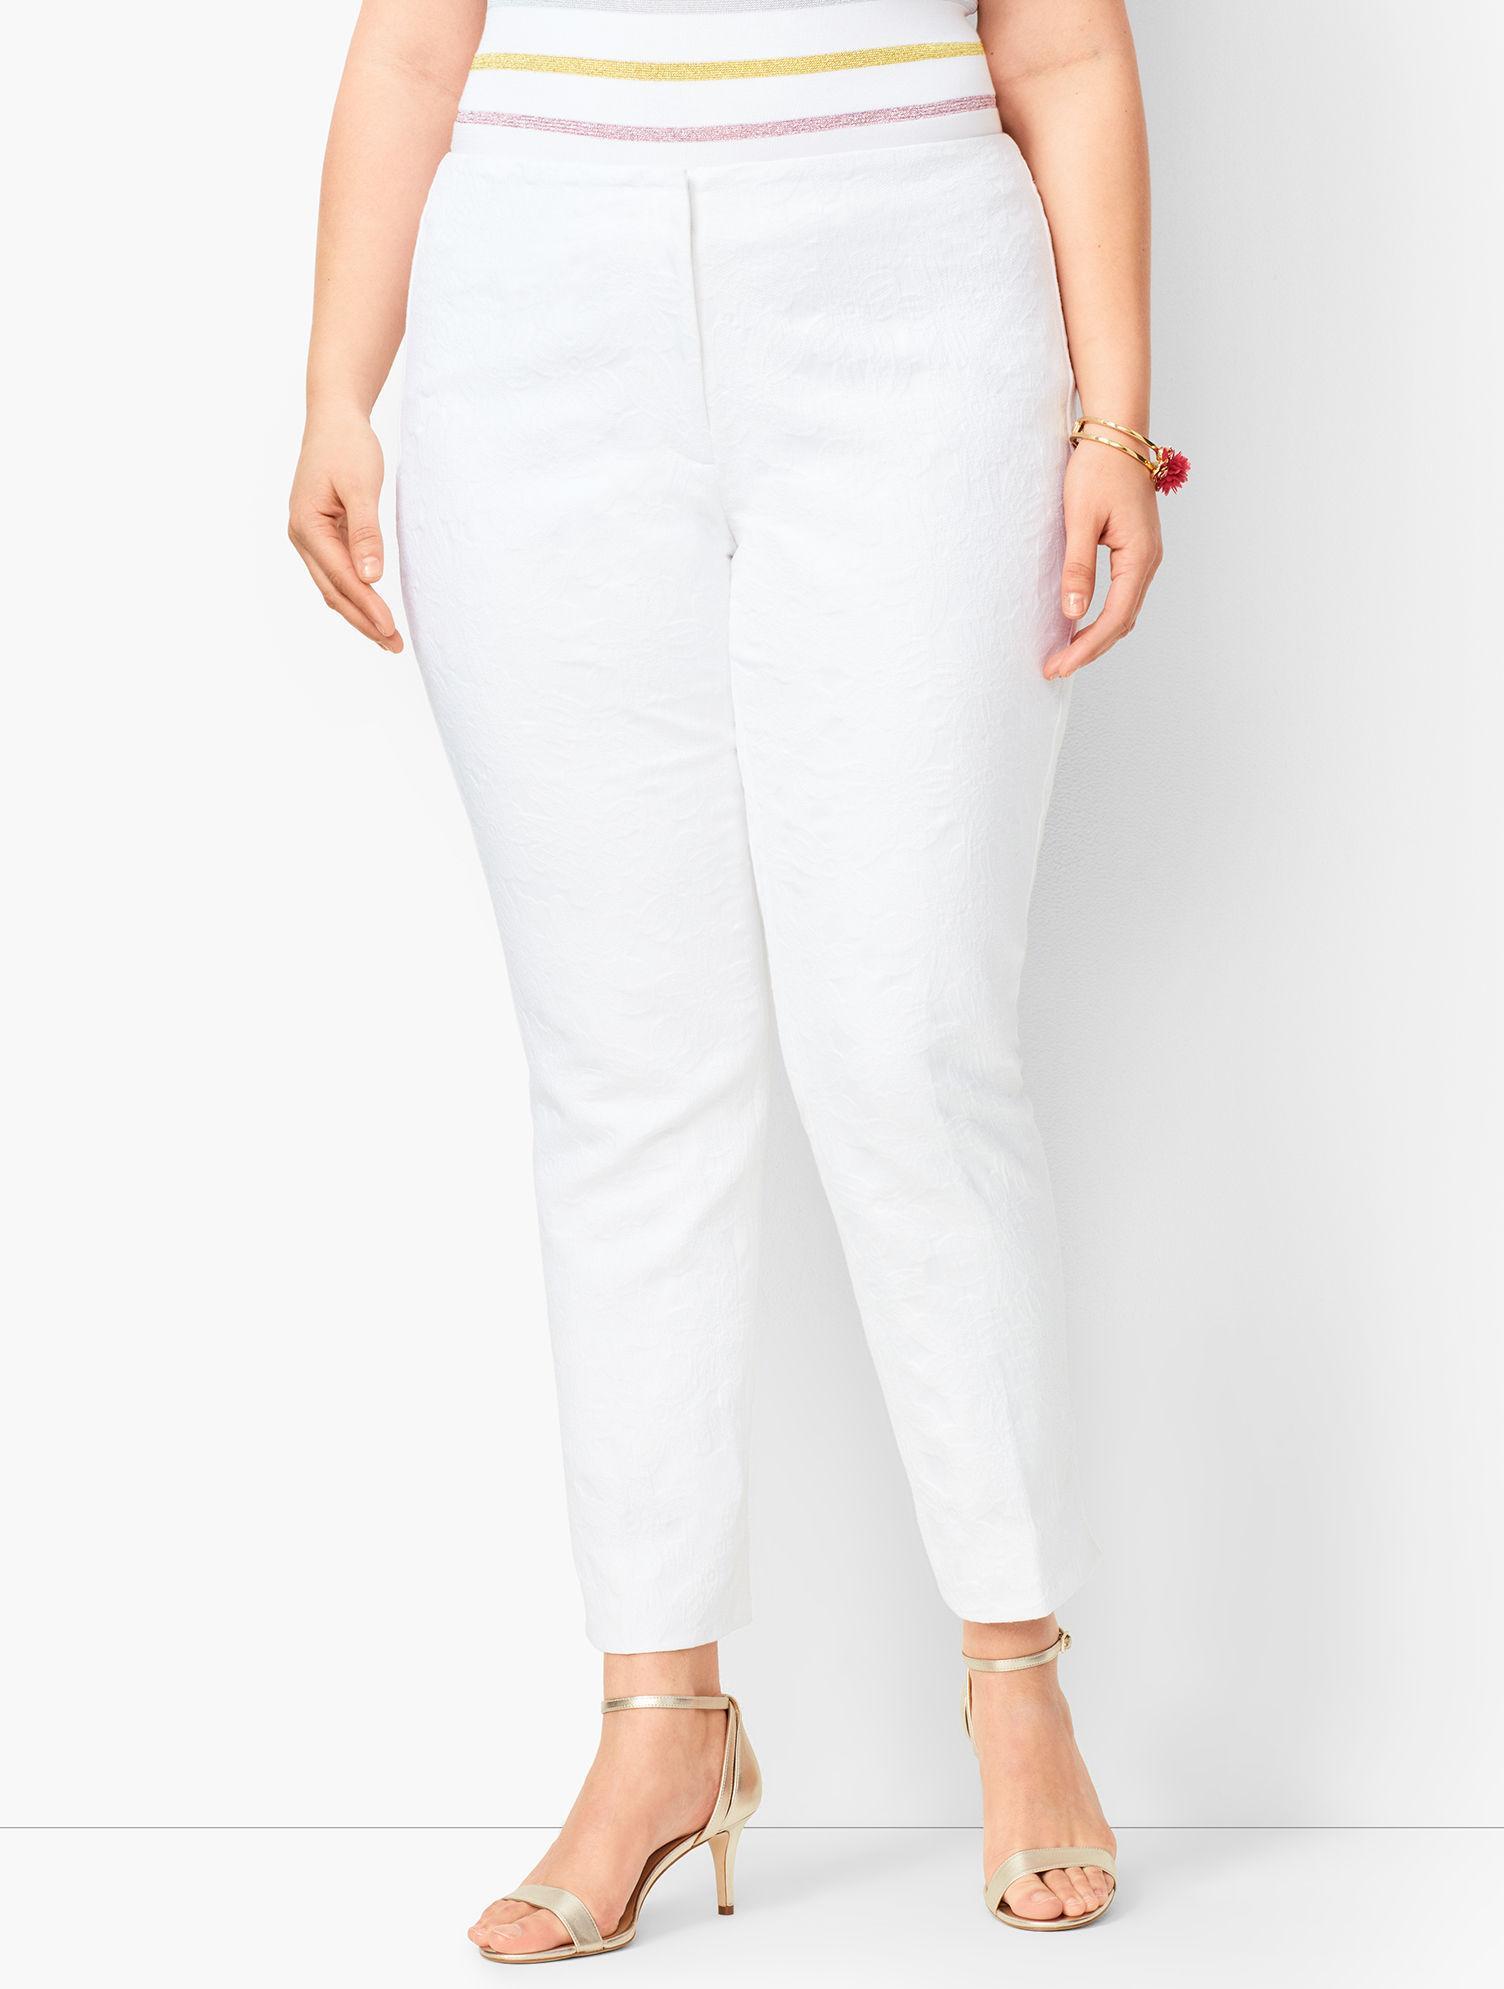 1baf0656f5 Talbots. Women s White Plus Size Matelassé Tailored Ankle Trousers